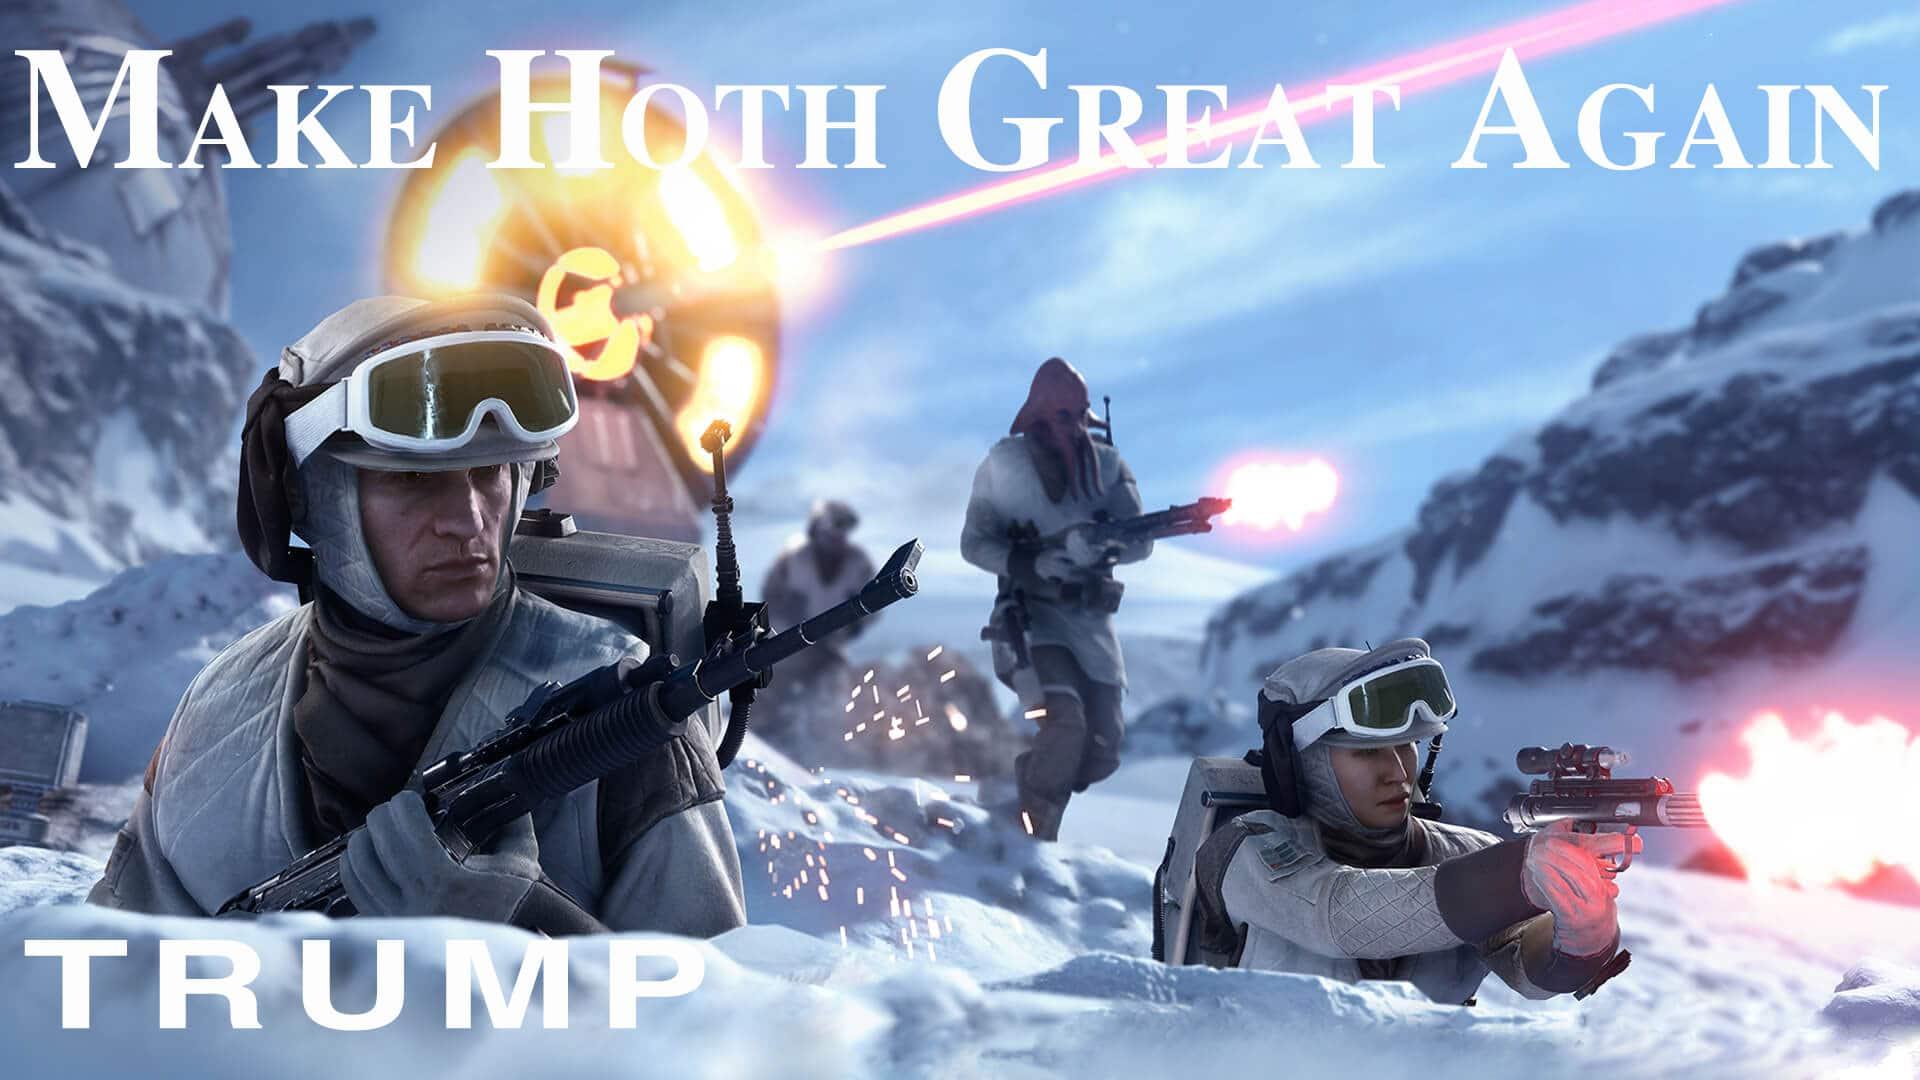 Make_Hoth_Great_Again